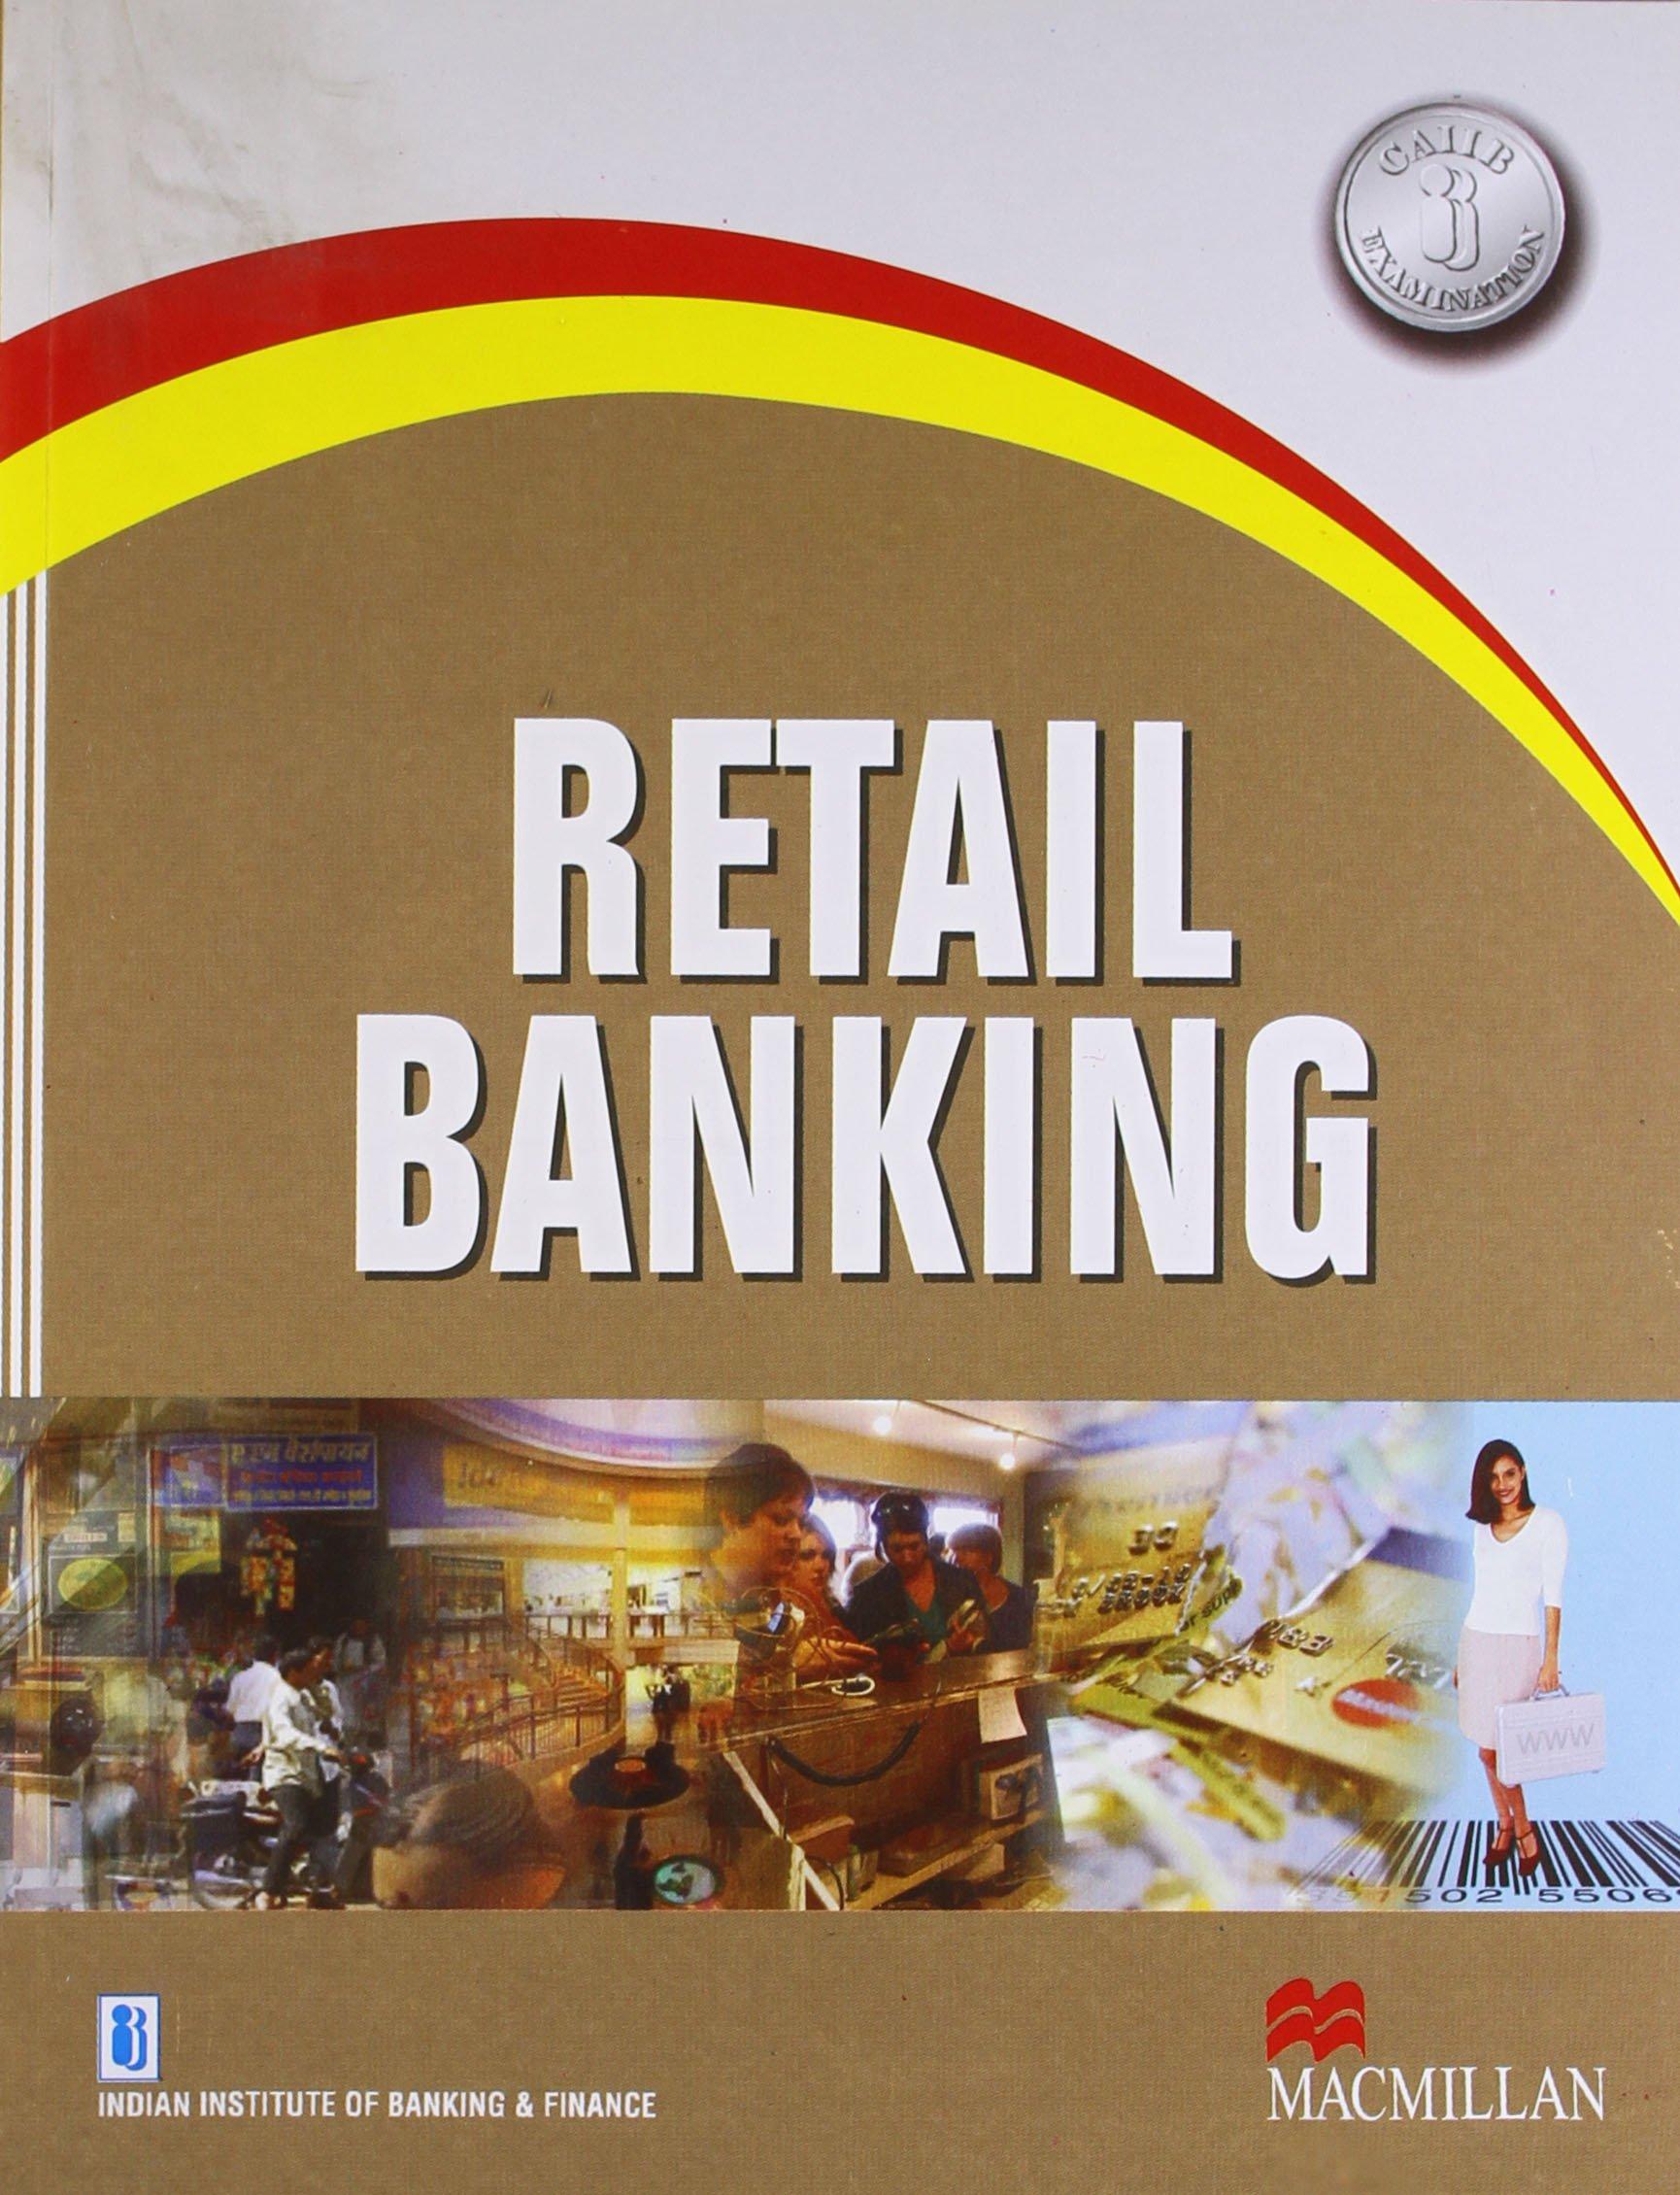 Retail banking for caiib examination amazon iibf indian retail banking for caiib examination amazon iibf indian institute of banking and finance books fandeluxe Choice Image